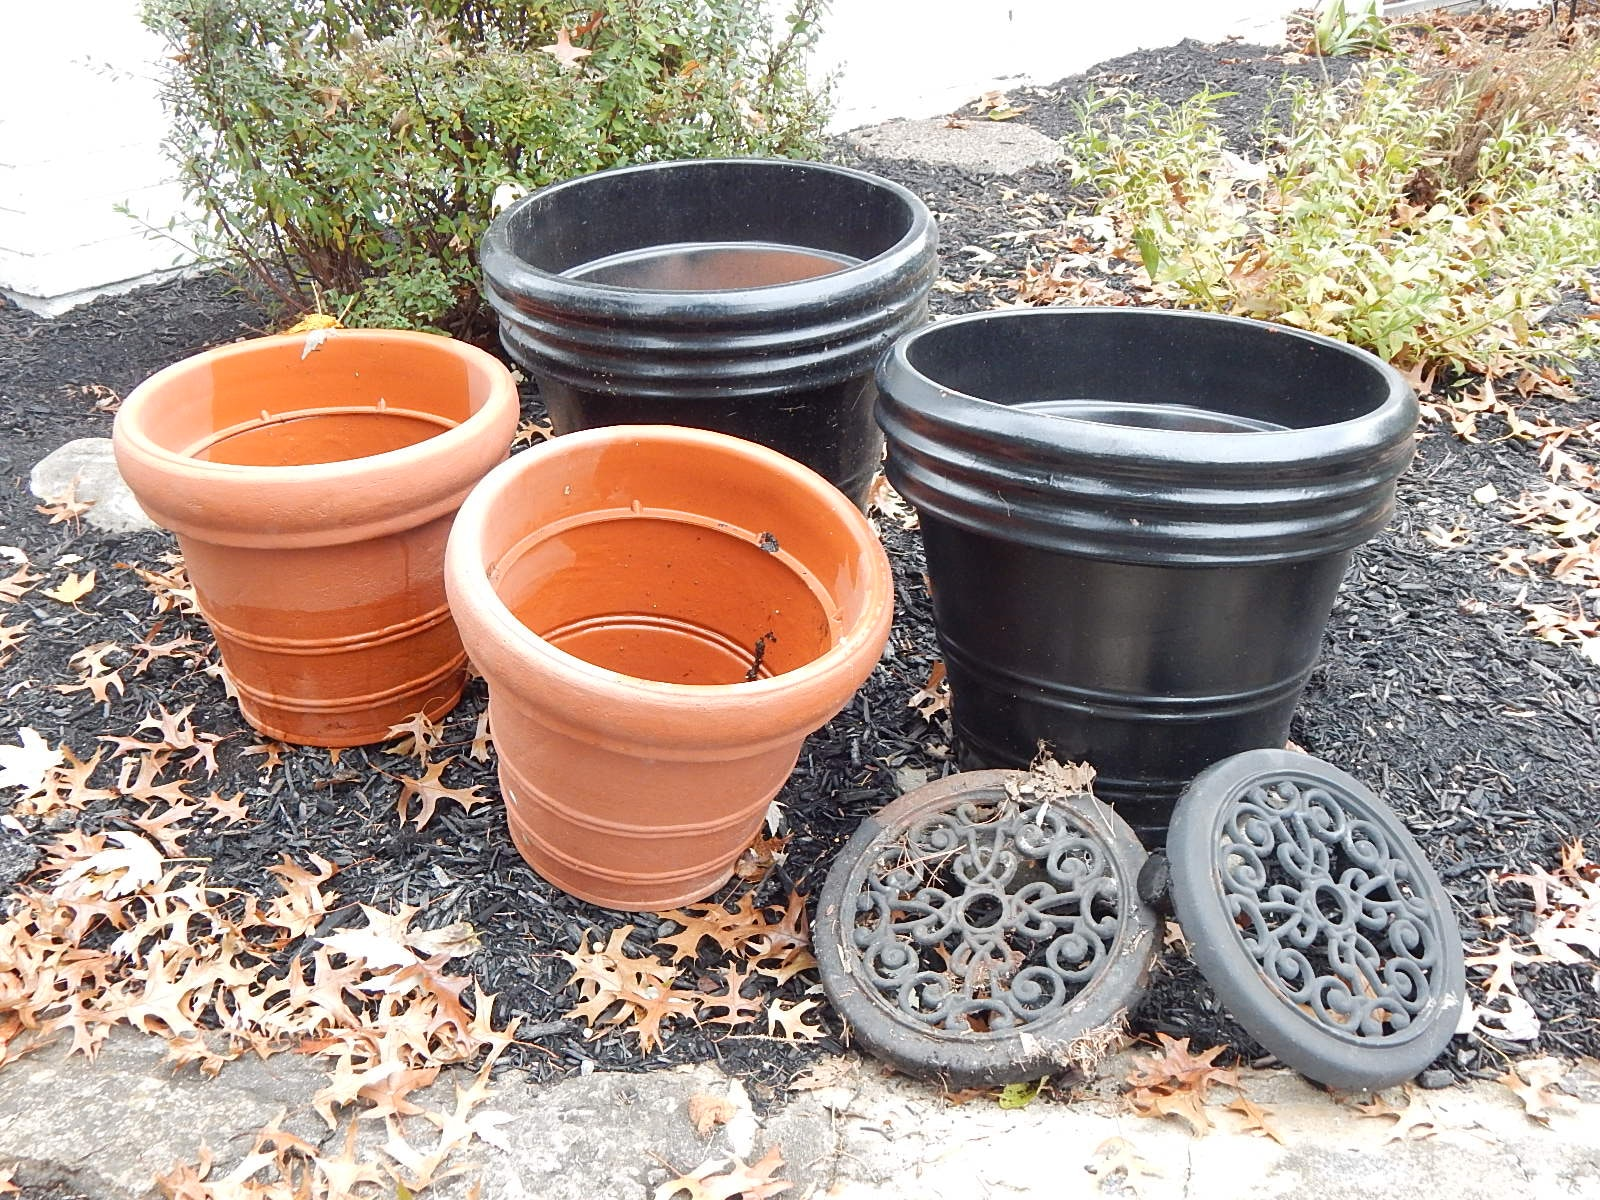 Outdoor Planters and Concrete Bird Bath